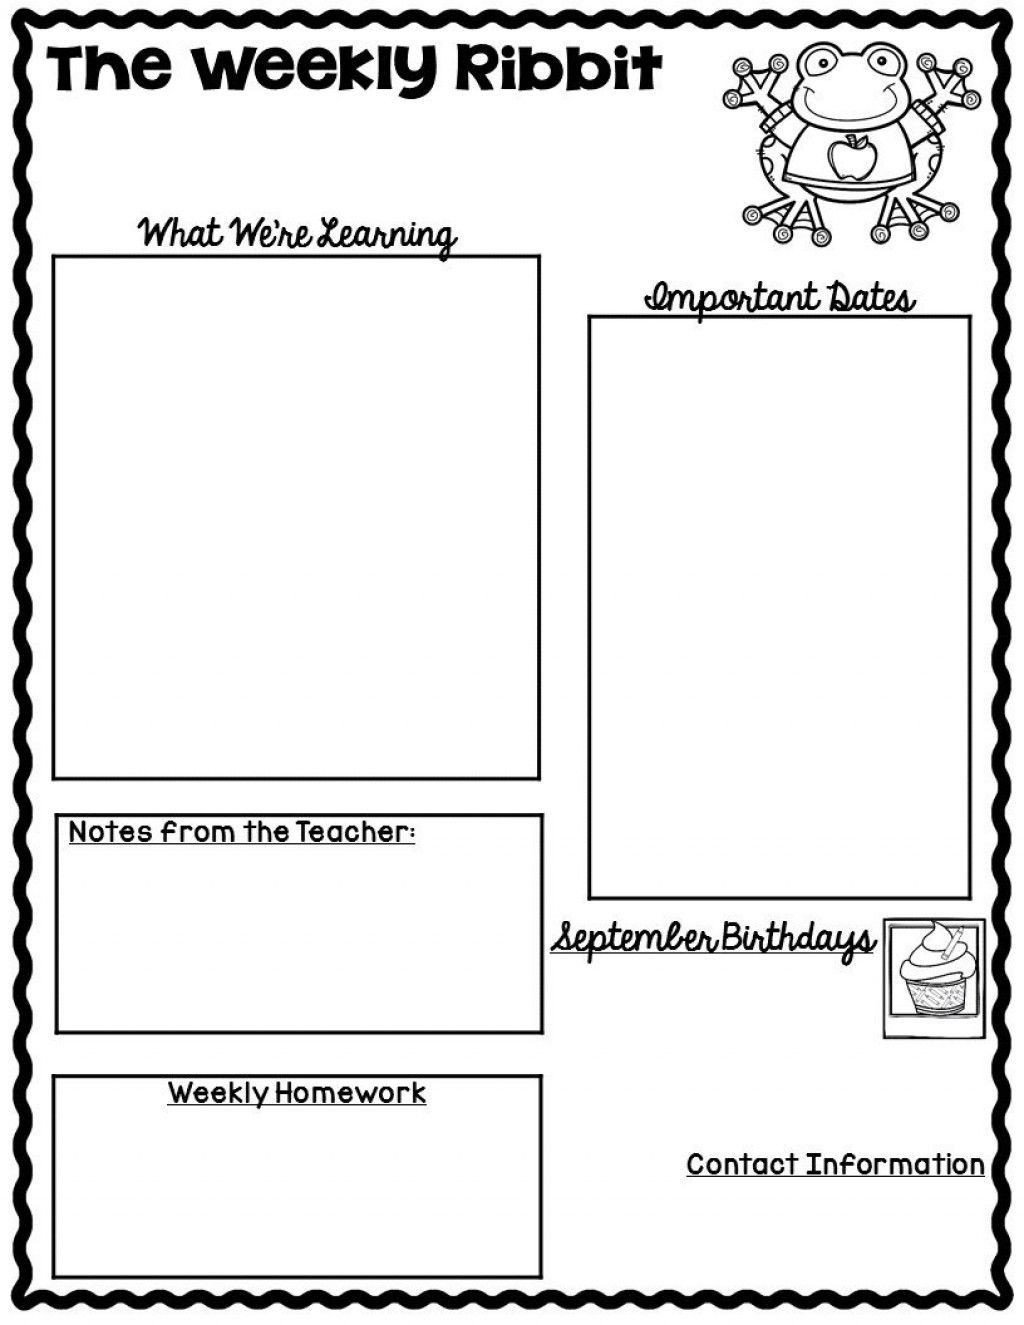 004 Awesome Google Newsletter Template For Teacher Image  Teachers FreeLarge